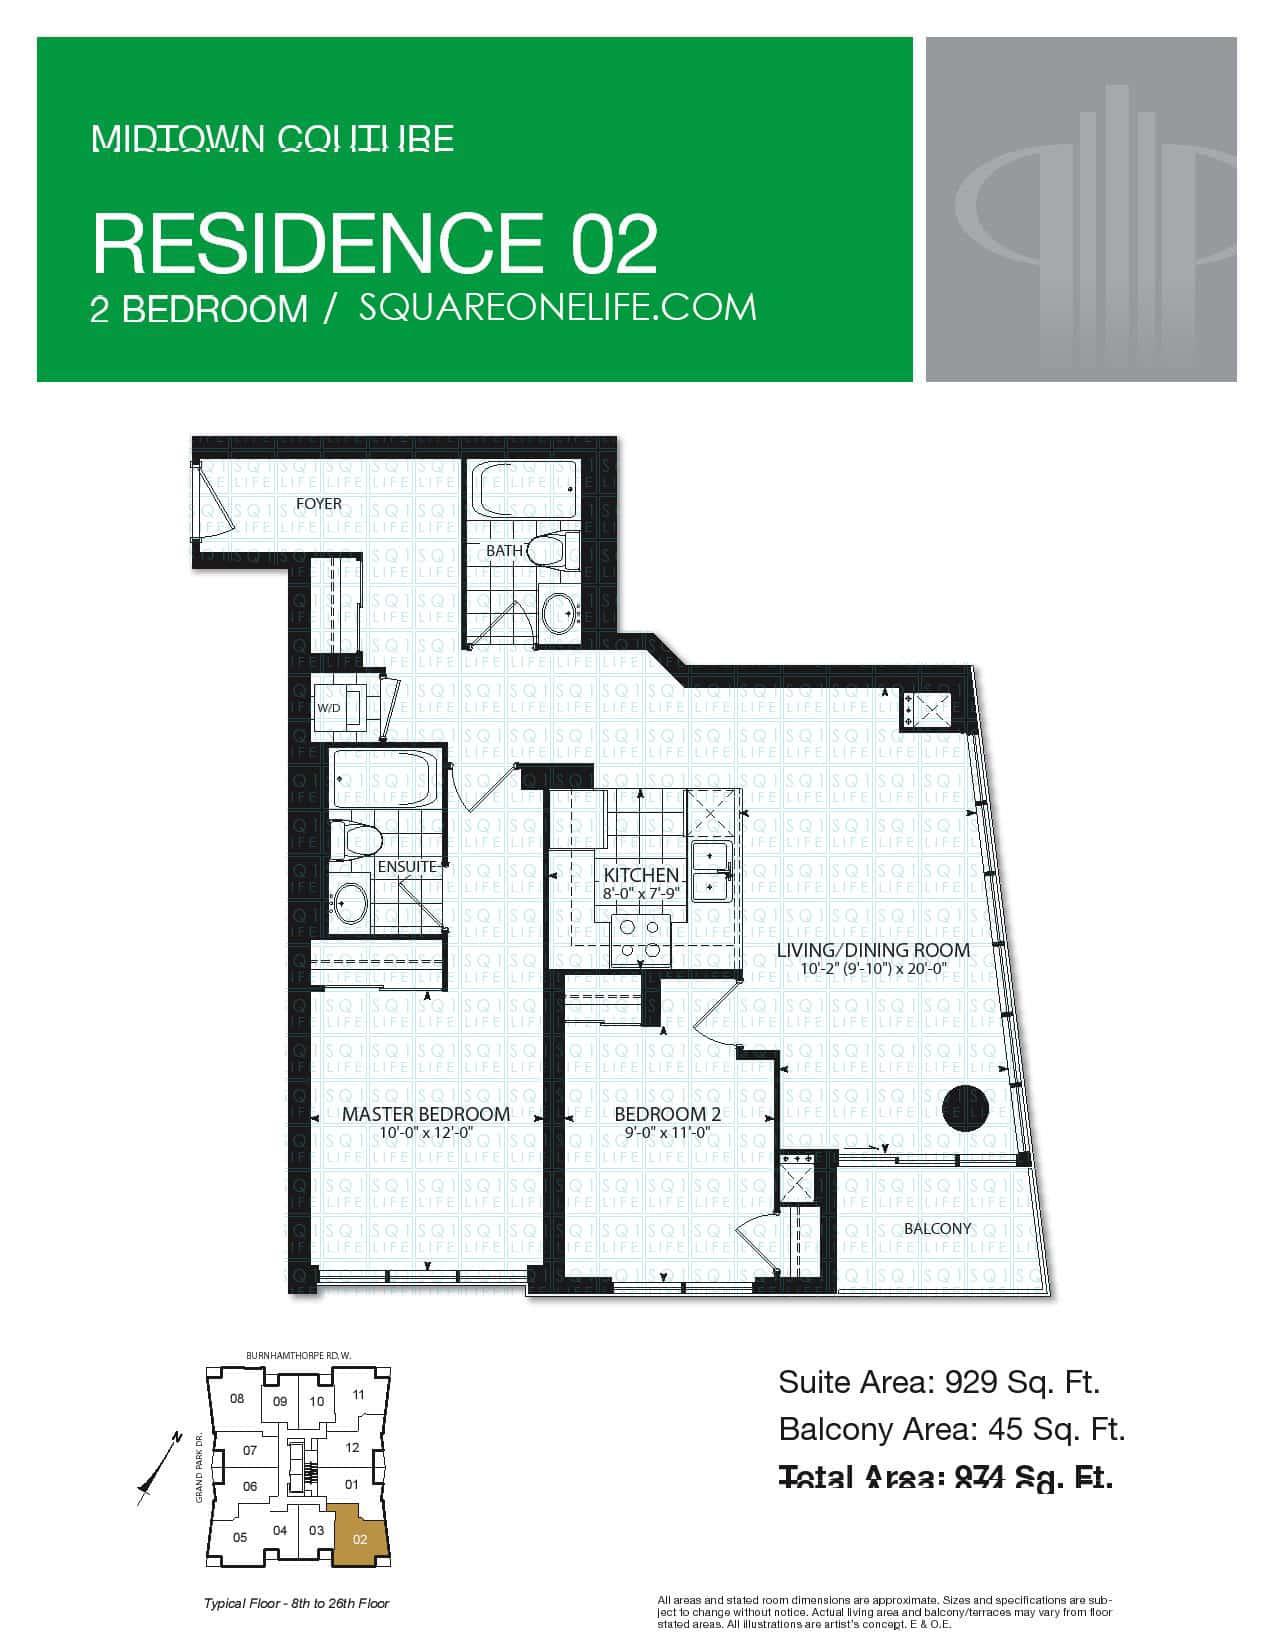 pinnacle grand park condo 3985 grand park dr squareonelife floorplan residence 2 2 bed 2 bath 929 sqft